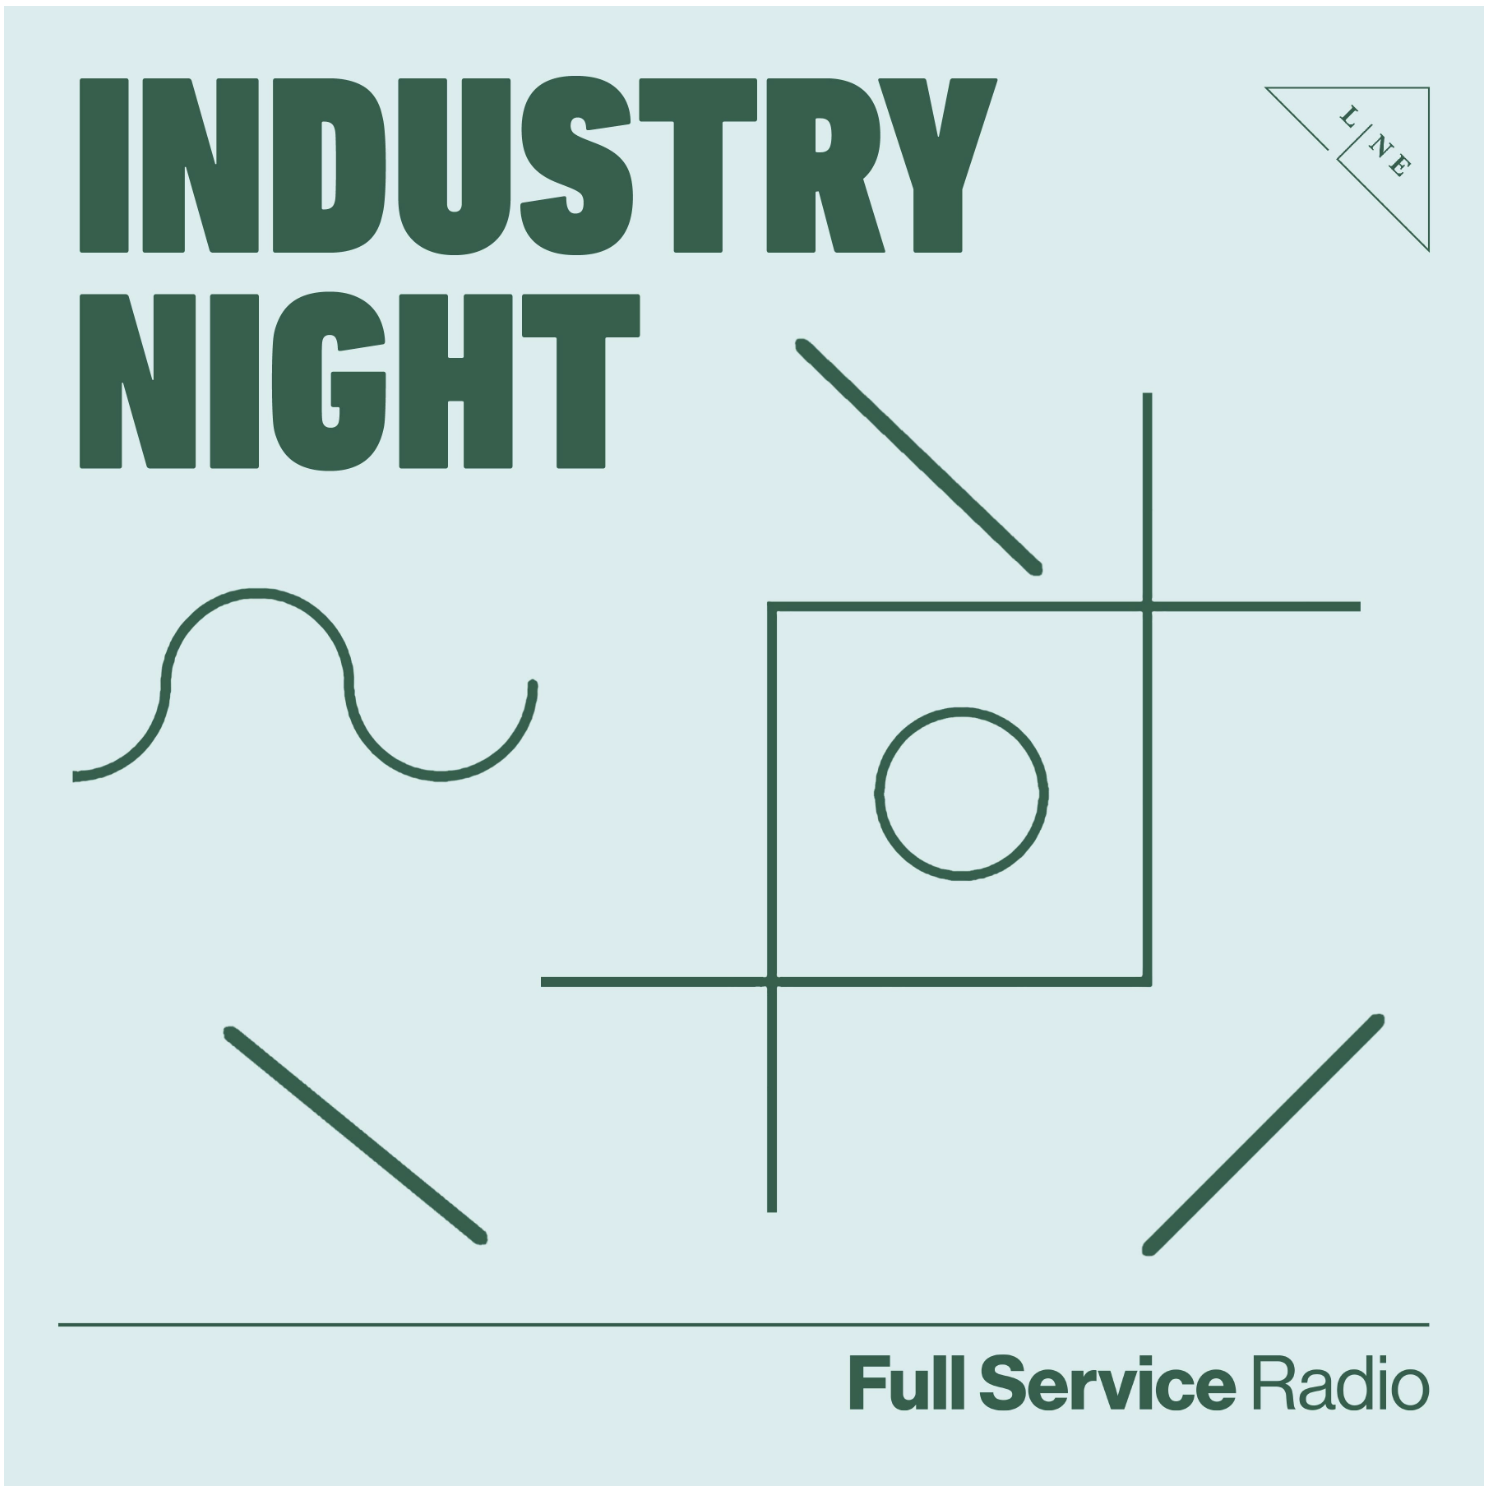 INDUSTRY NIGHT - FOODIE & THE BEAST  (episode 9) March 4, 2018  Chapel Hill Farm  (listen online)